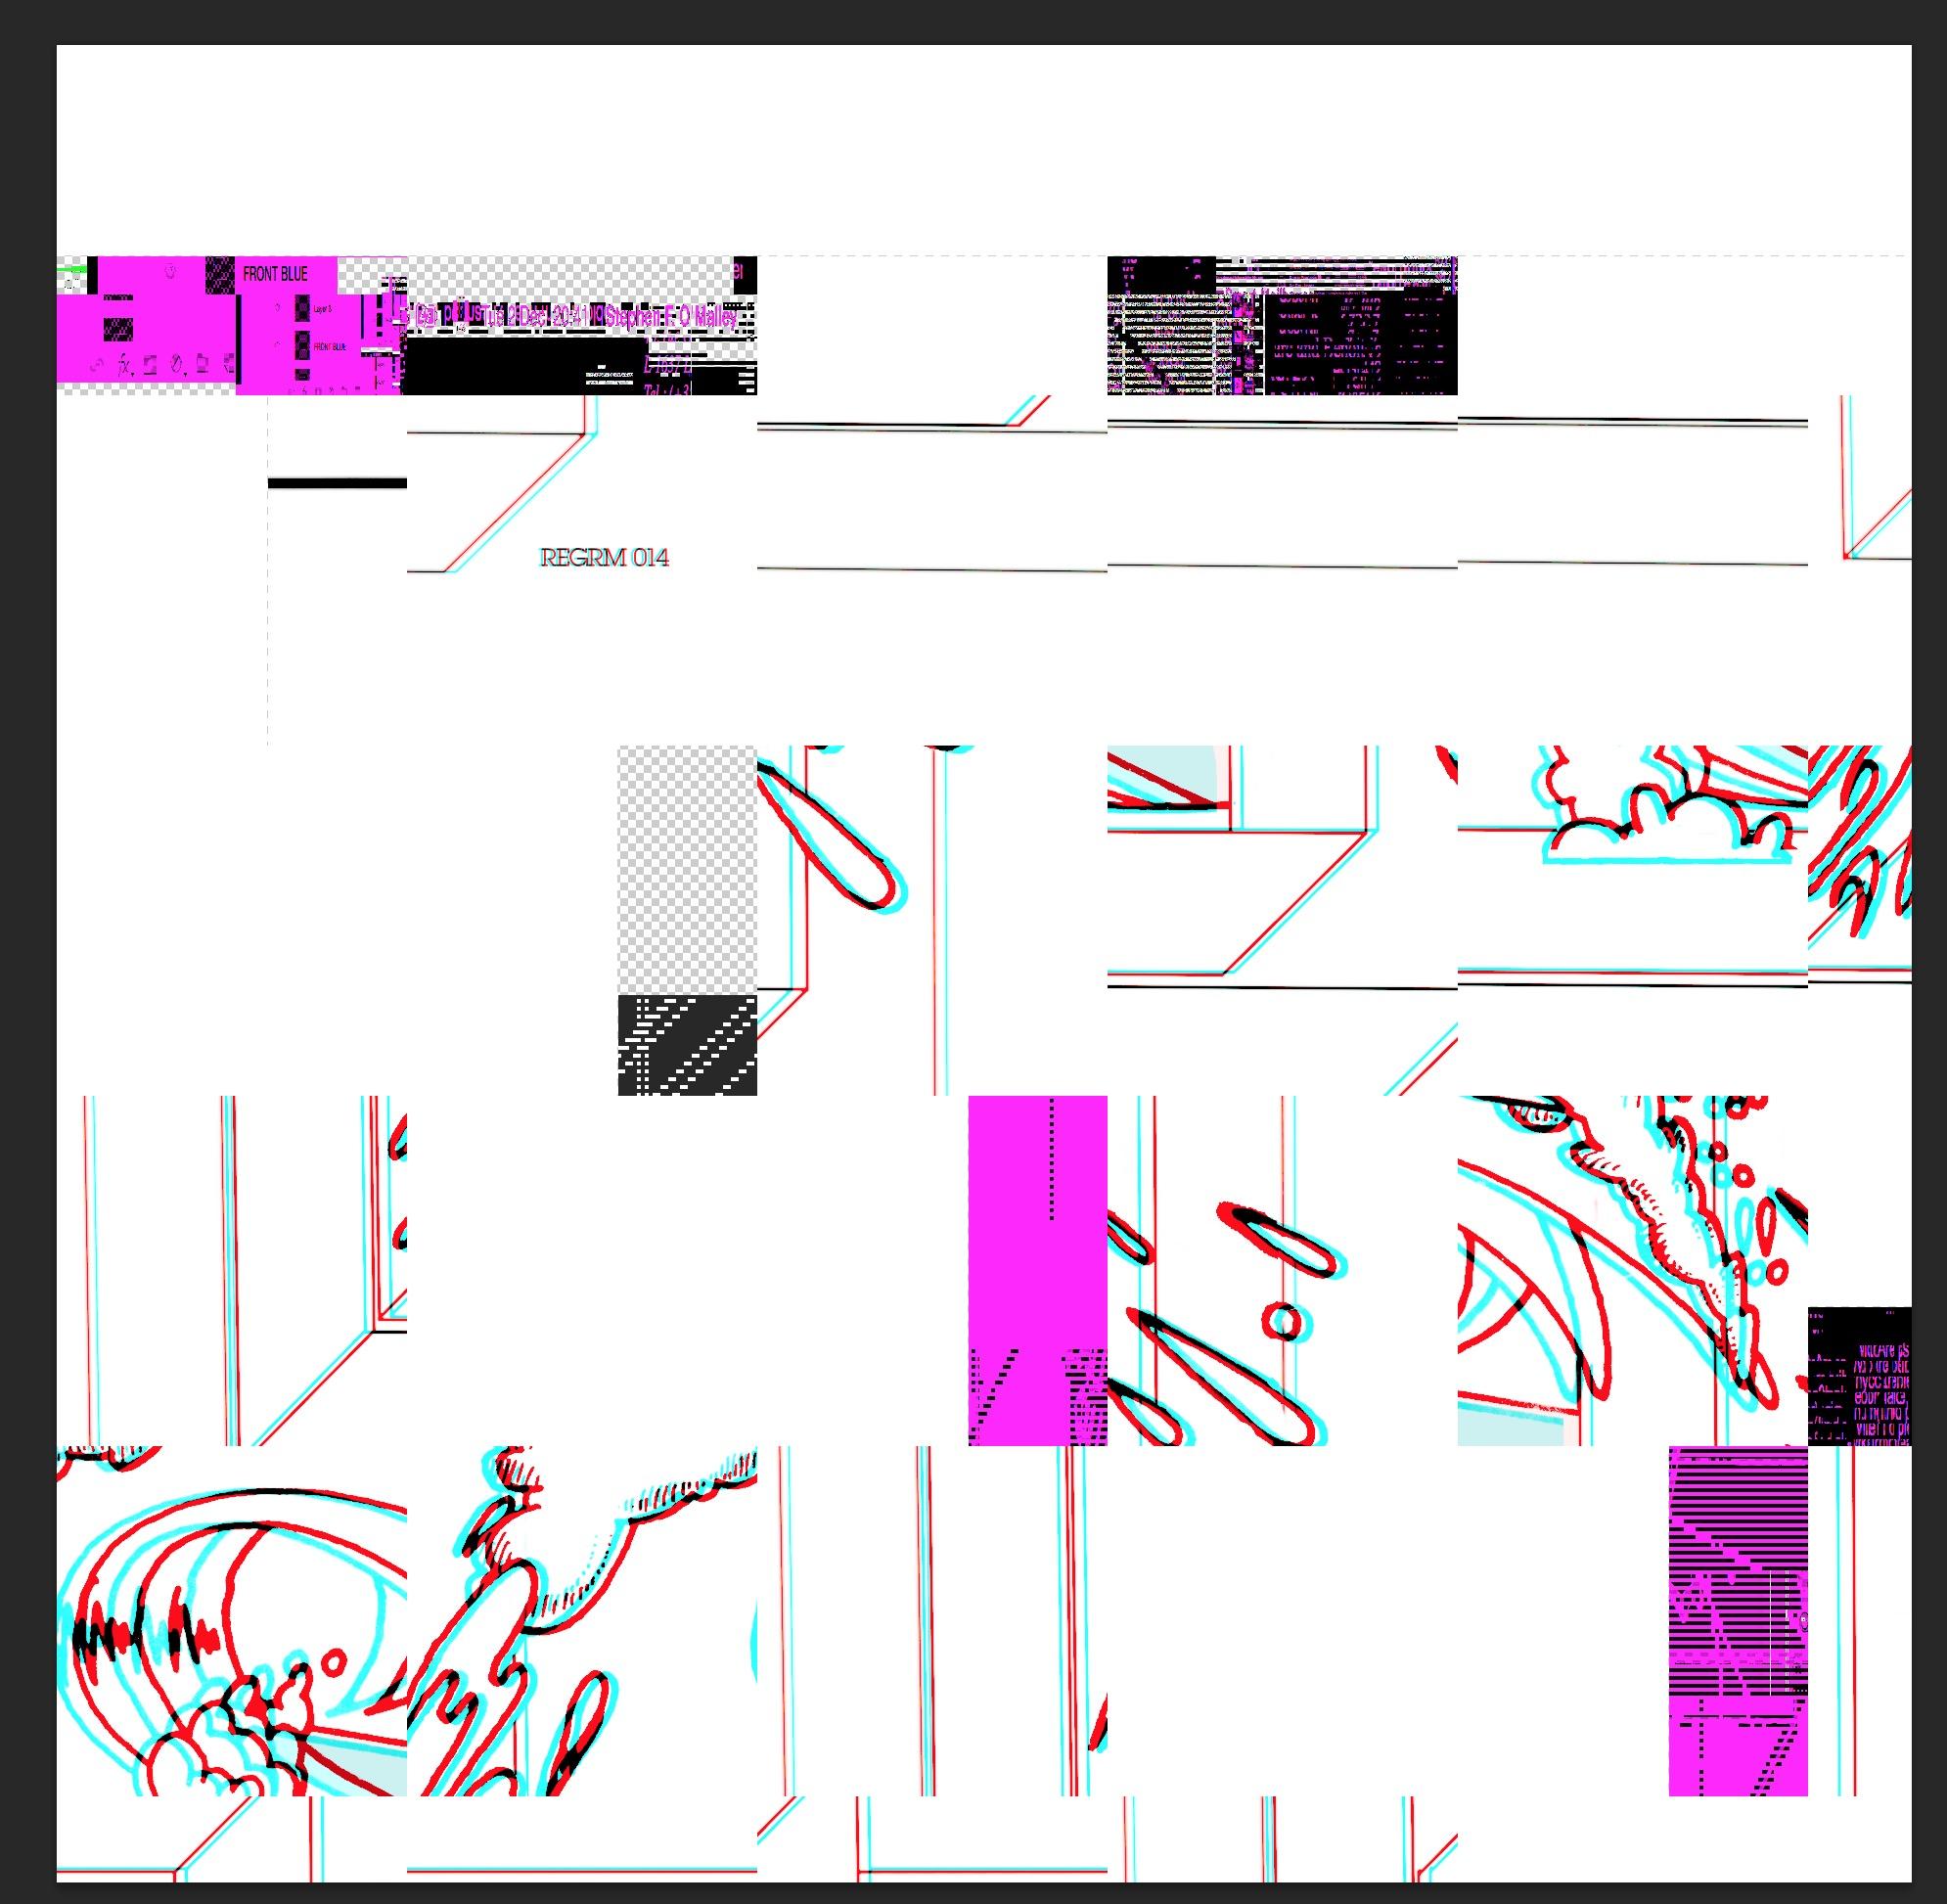 Yasunao Tone in the machine (render error REGRM014)